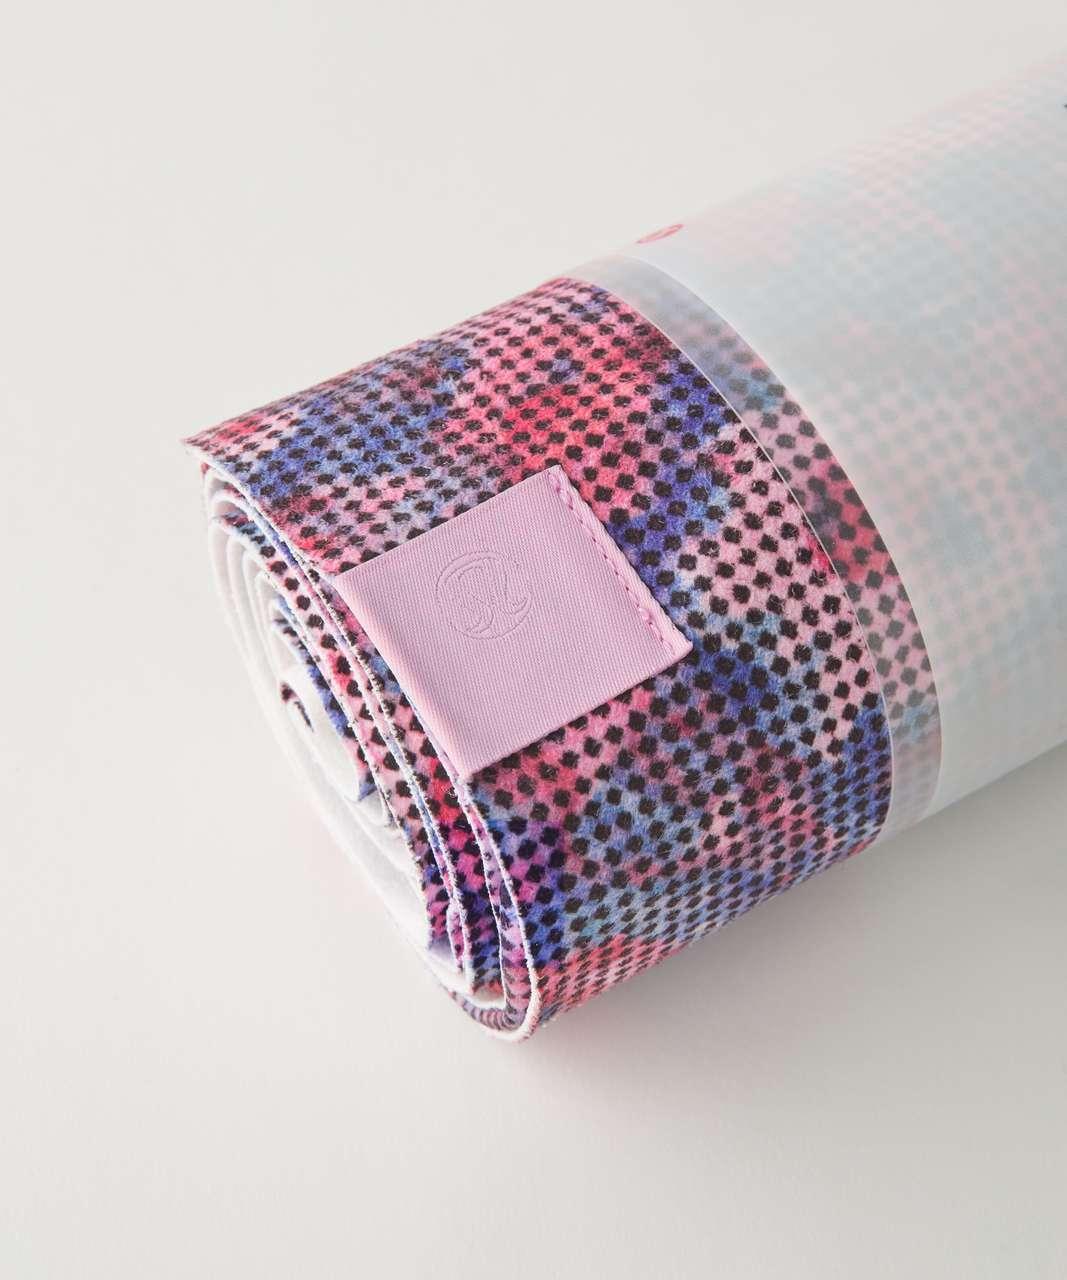 Lululemon The Towel - Checker Blooms Multi